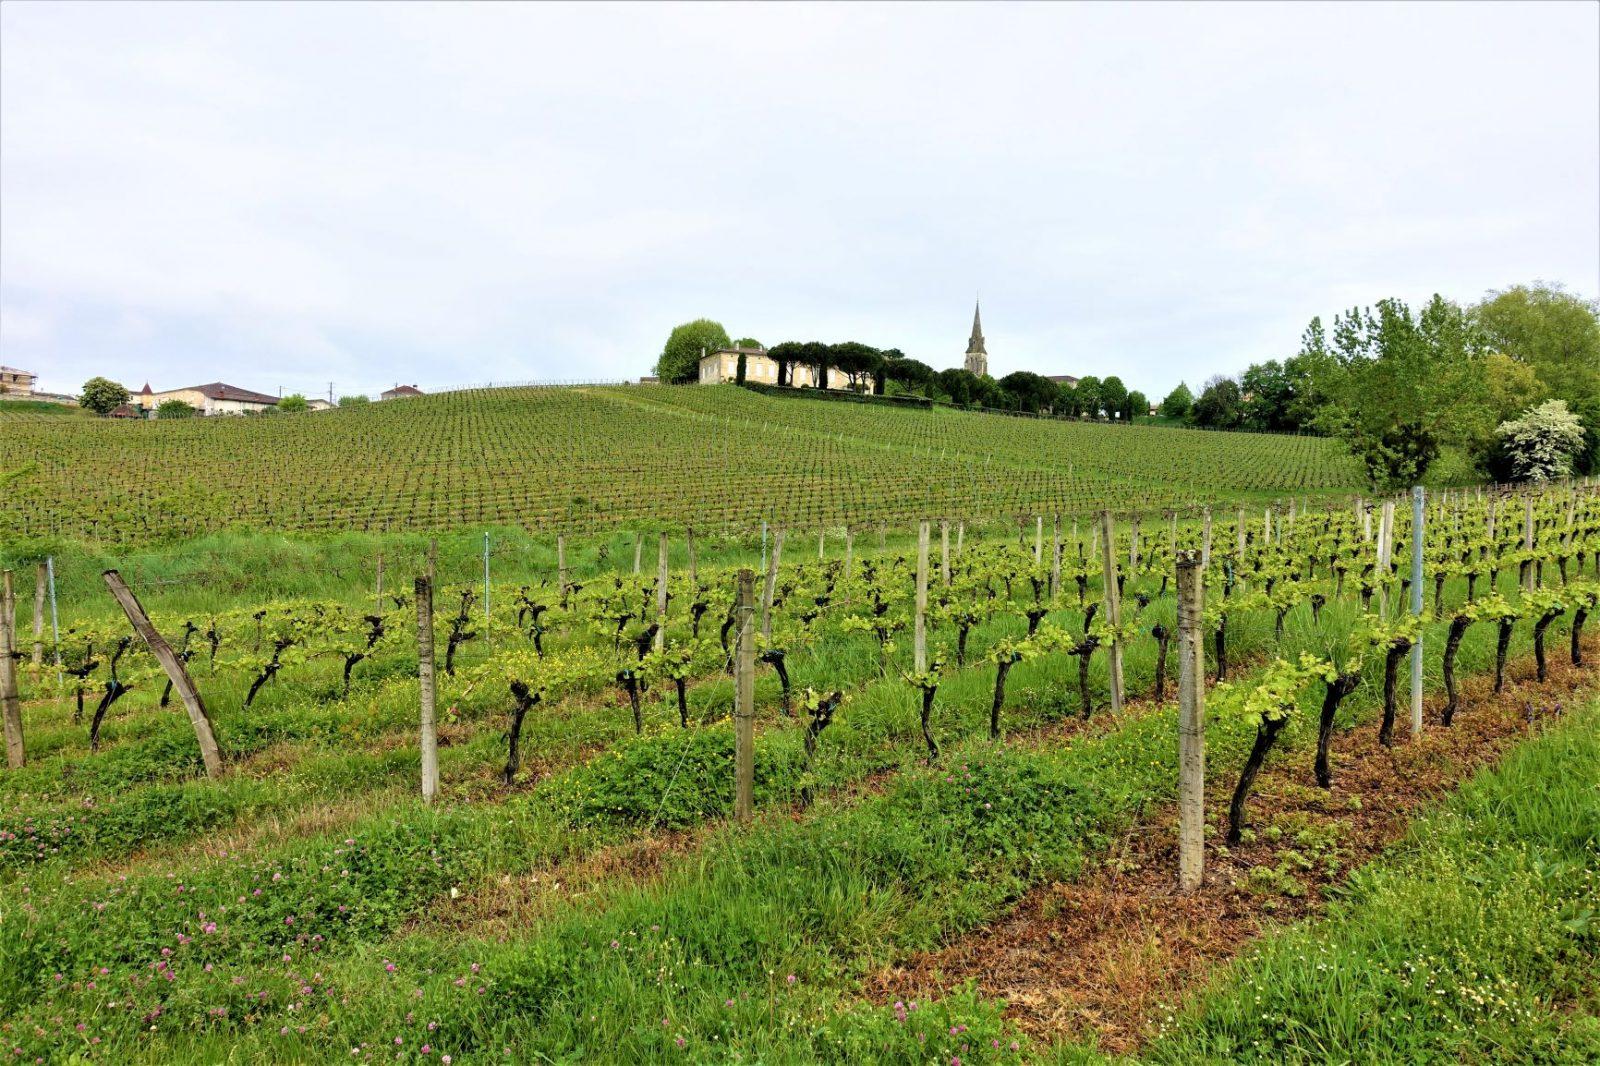 vingård utenforbordeaux